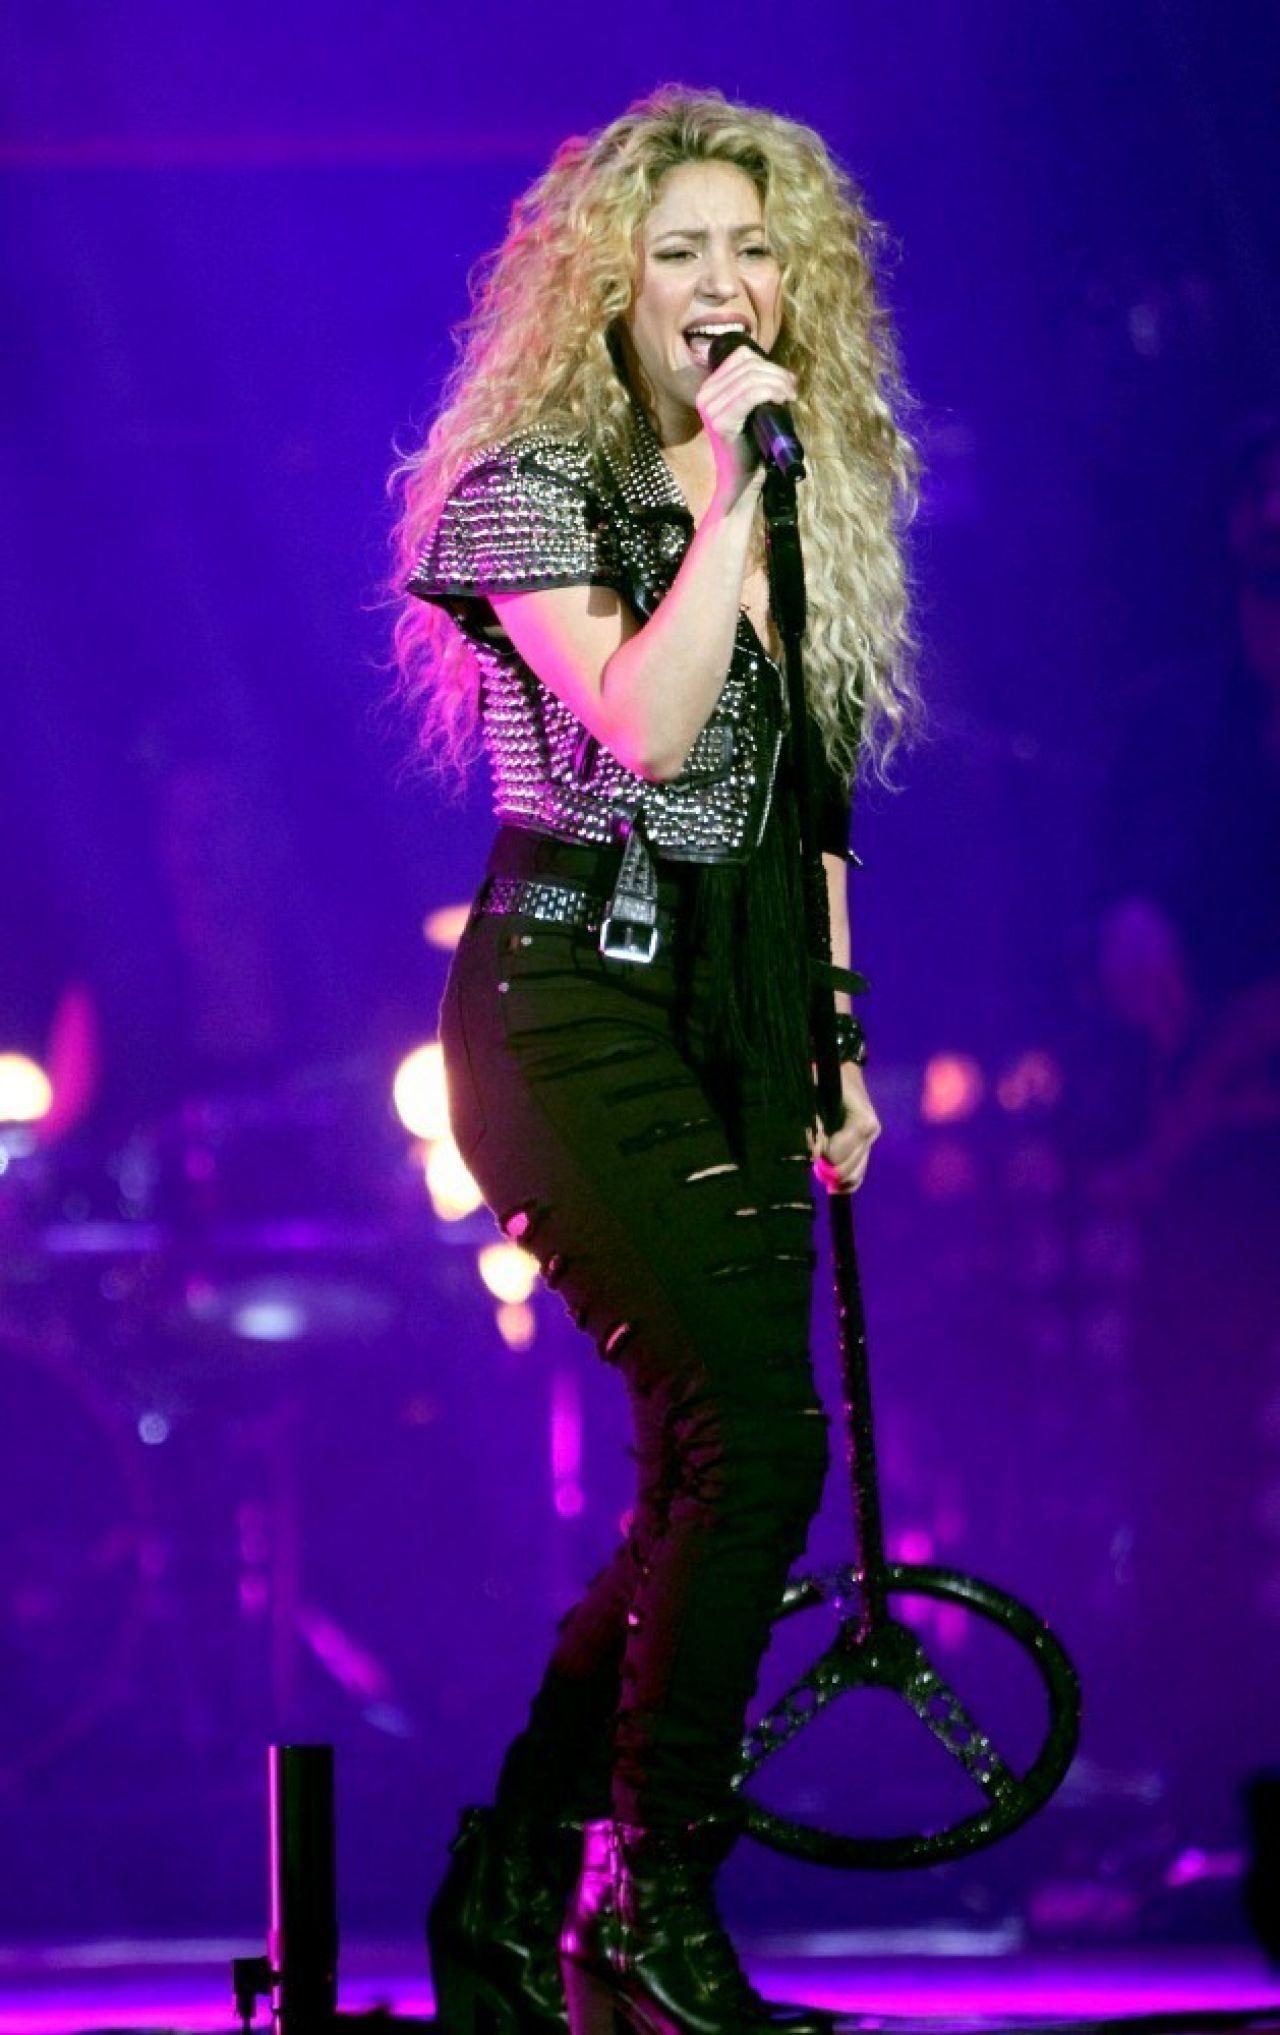 Shakira at the TMobil Public Promo Concert in Bryant Park